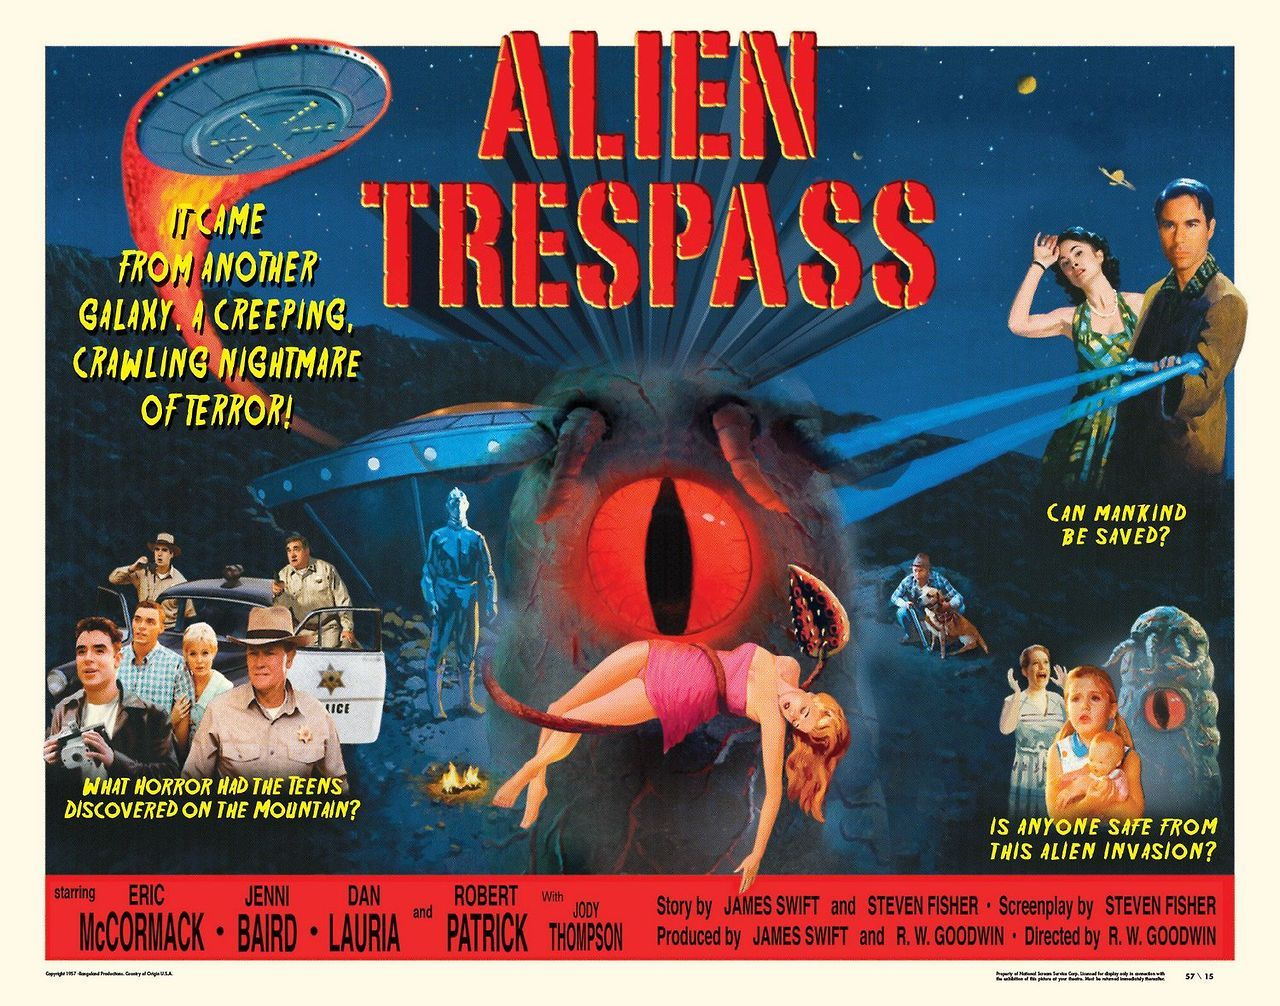 Robert Patrick, Eric McCormack, Dan Lauria, and Jenni Baird in Alien Trespass (2009)